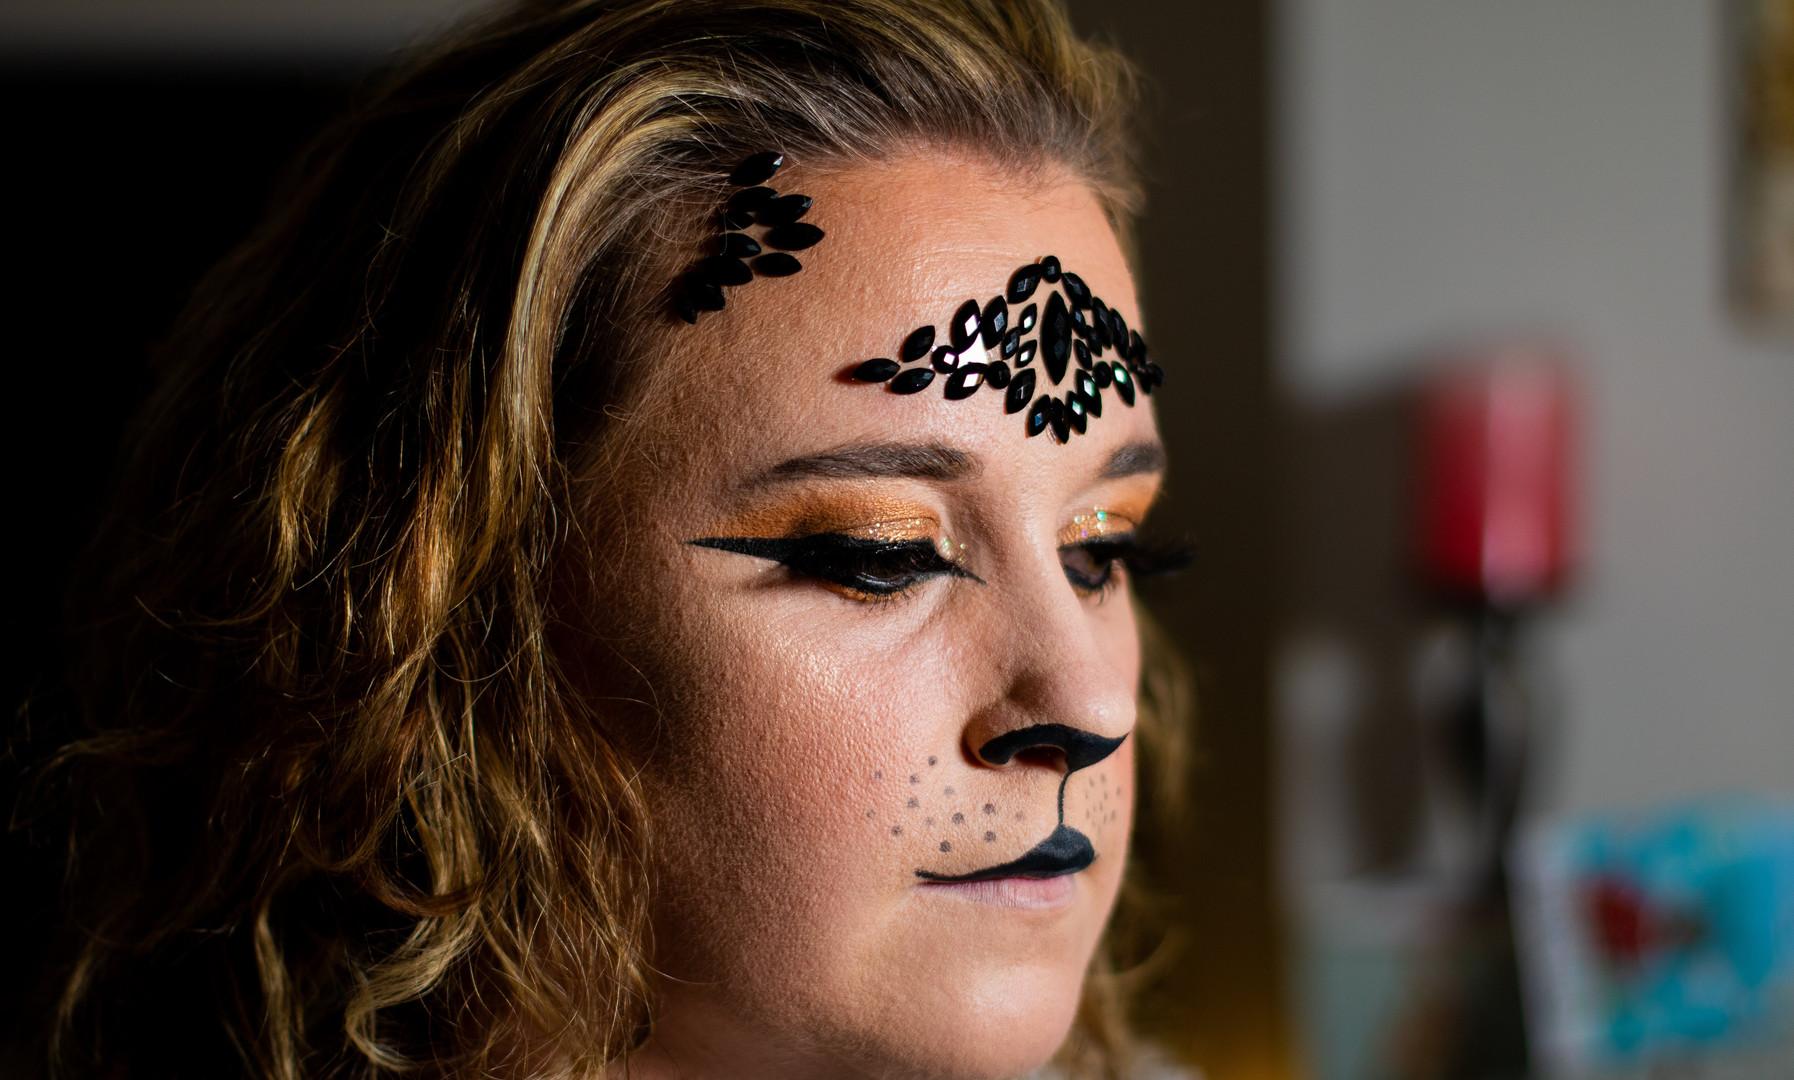 Glam lion fancy dress makeup